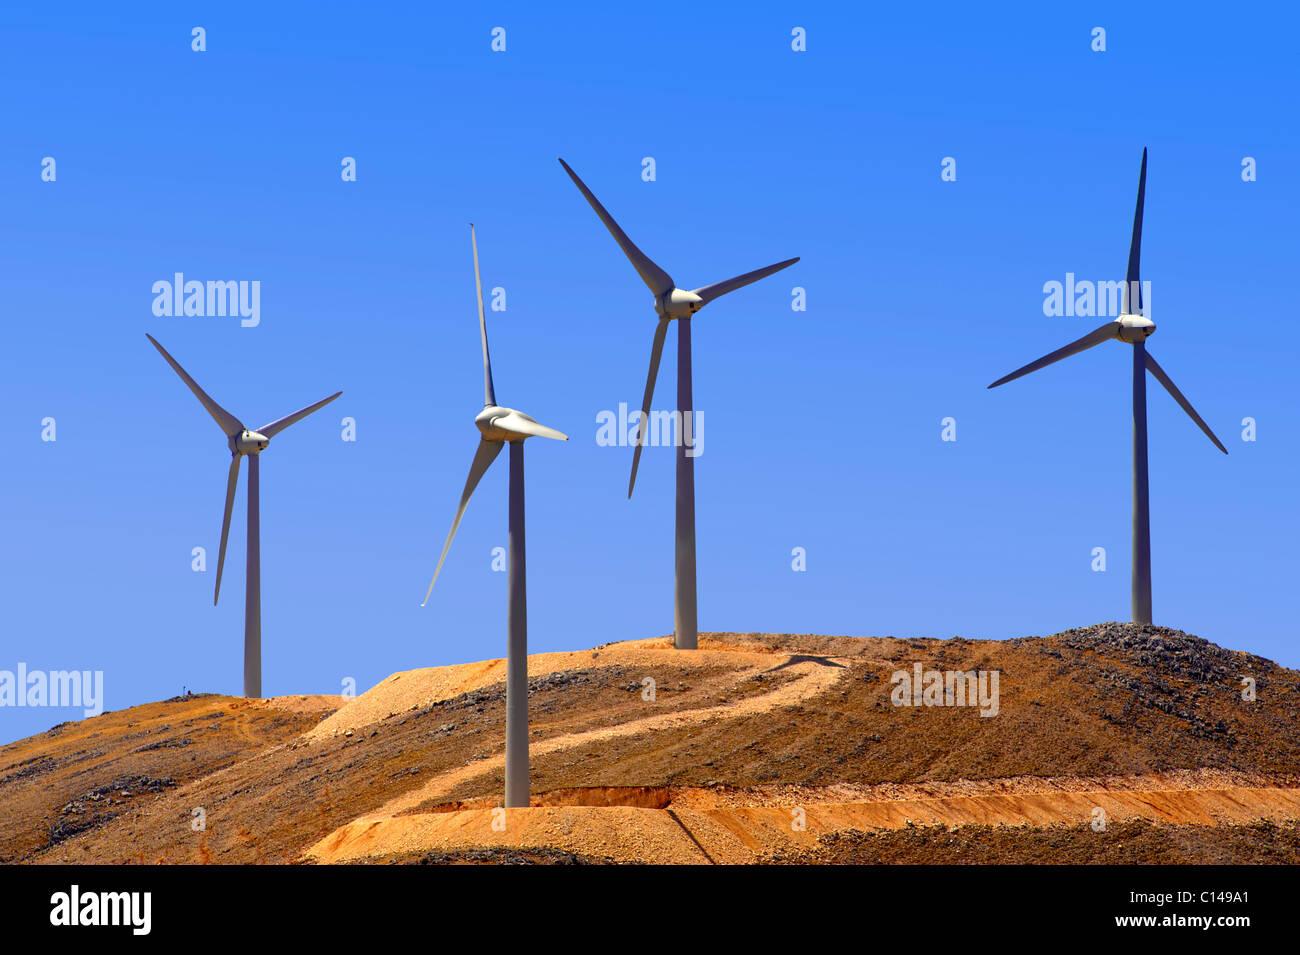 Wind farm on Kefalonia, Ionian Islands, Greece. - Stock Image